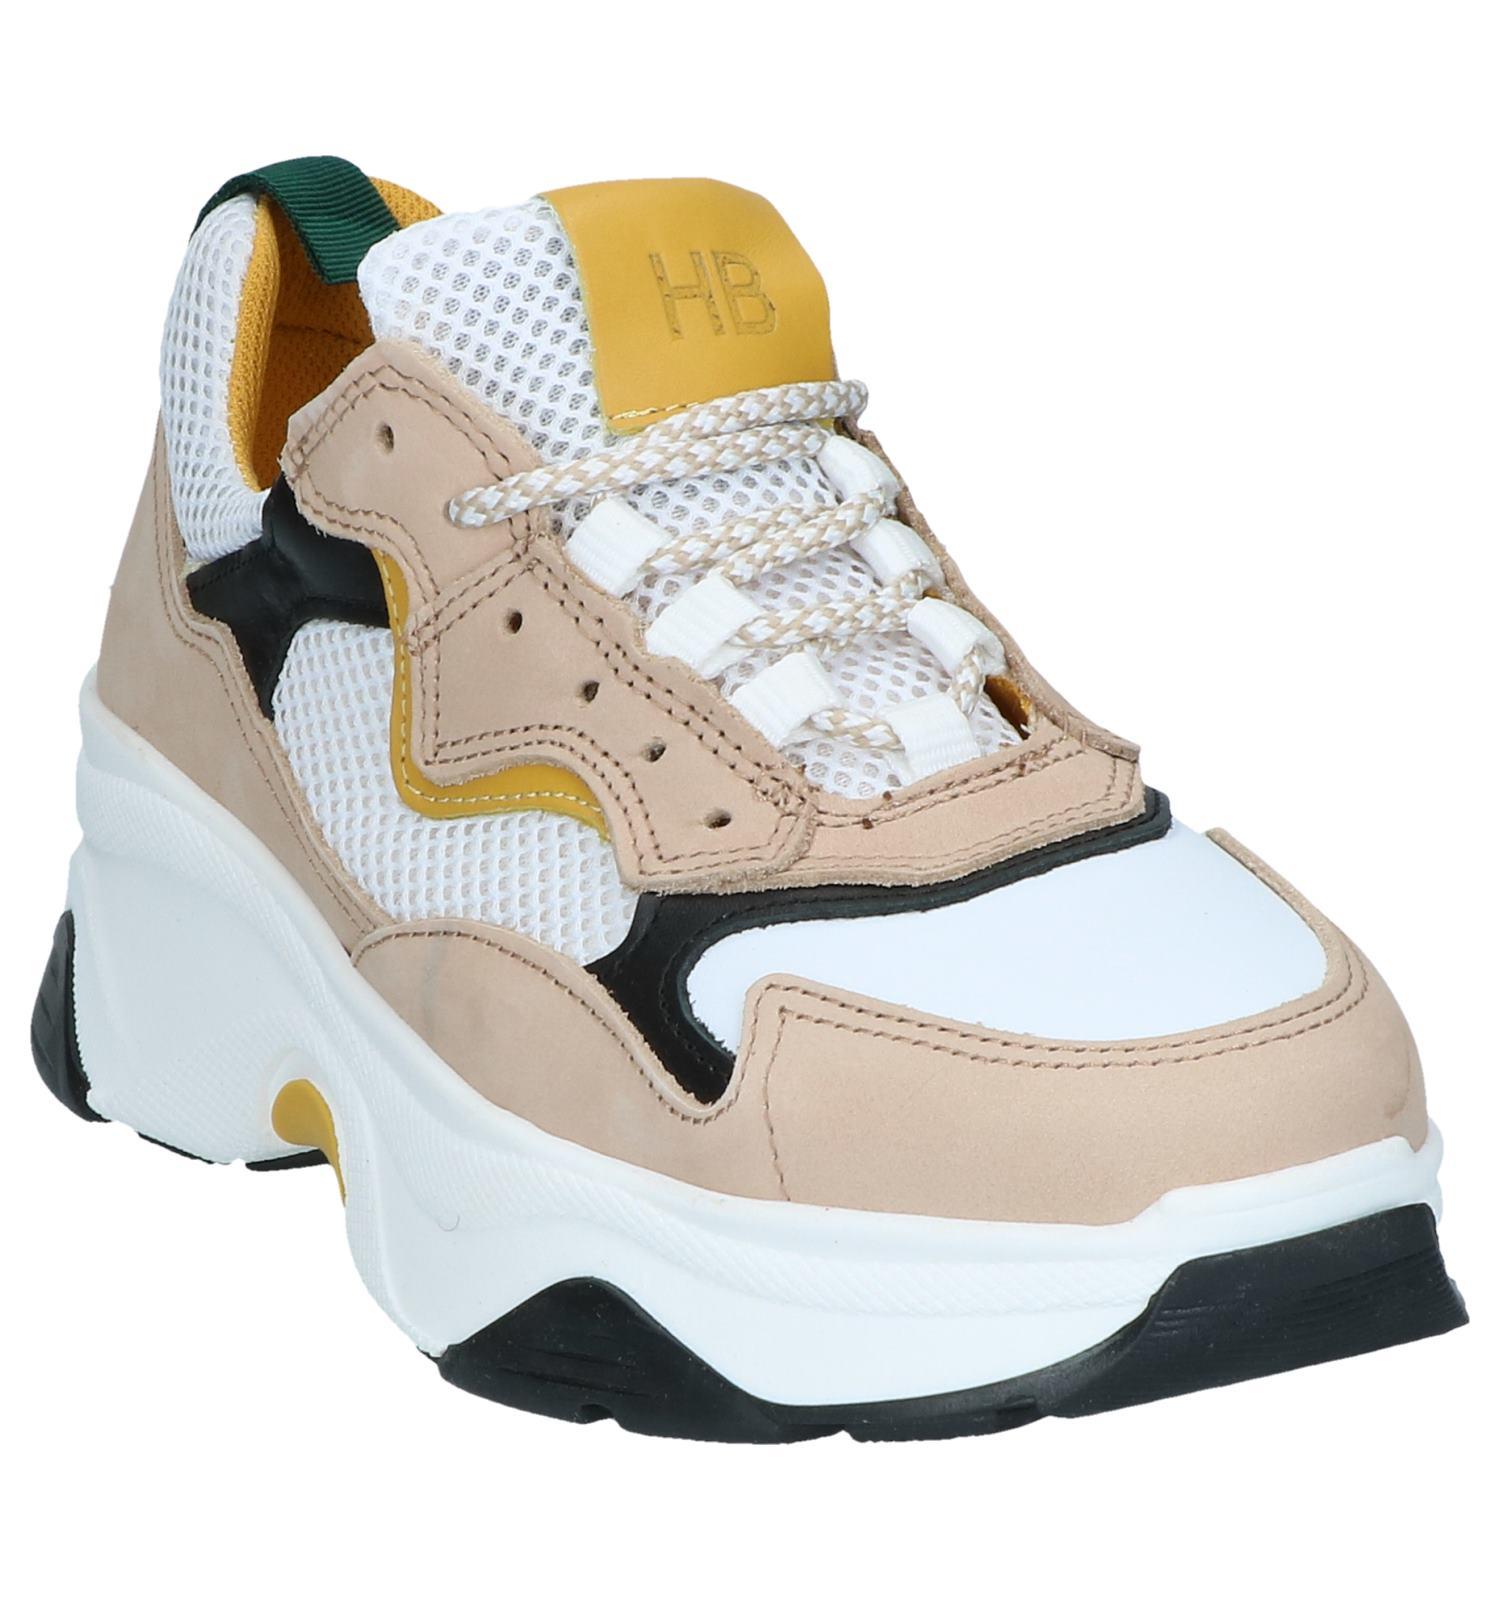 a2a1e9cde9d5b3 Multicolor Nineties Sneakers Hampton Bays | TORFS.BE | Gratis verzend en  retour